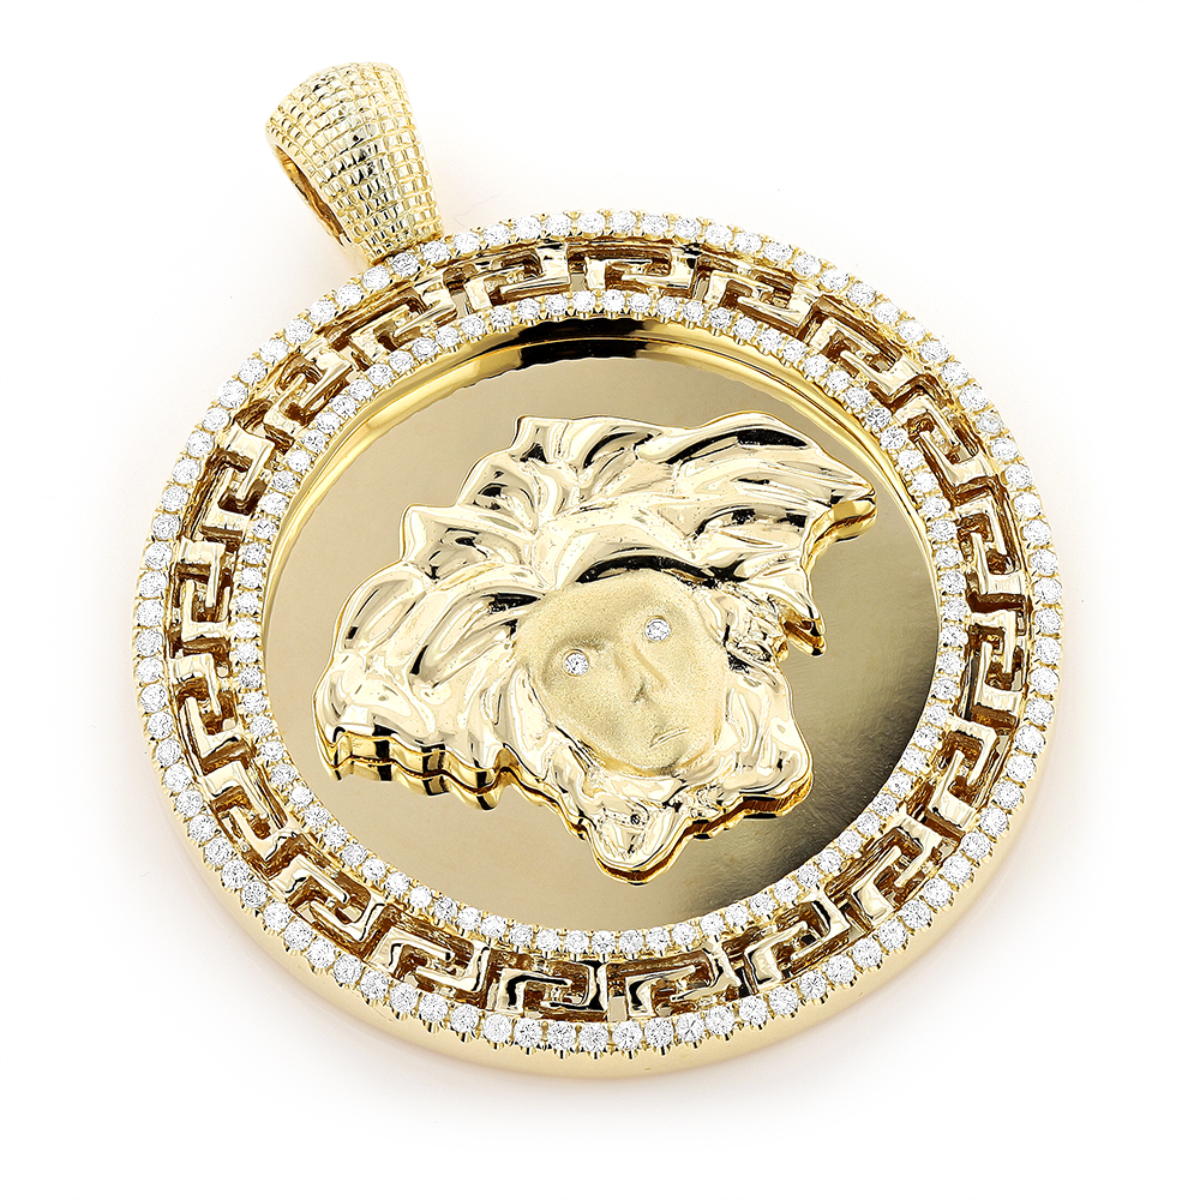 10k Gold Medusa Medallion Versace Style Diamond Pendant 1.86ct